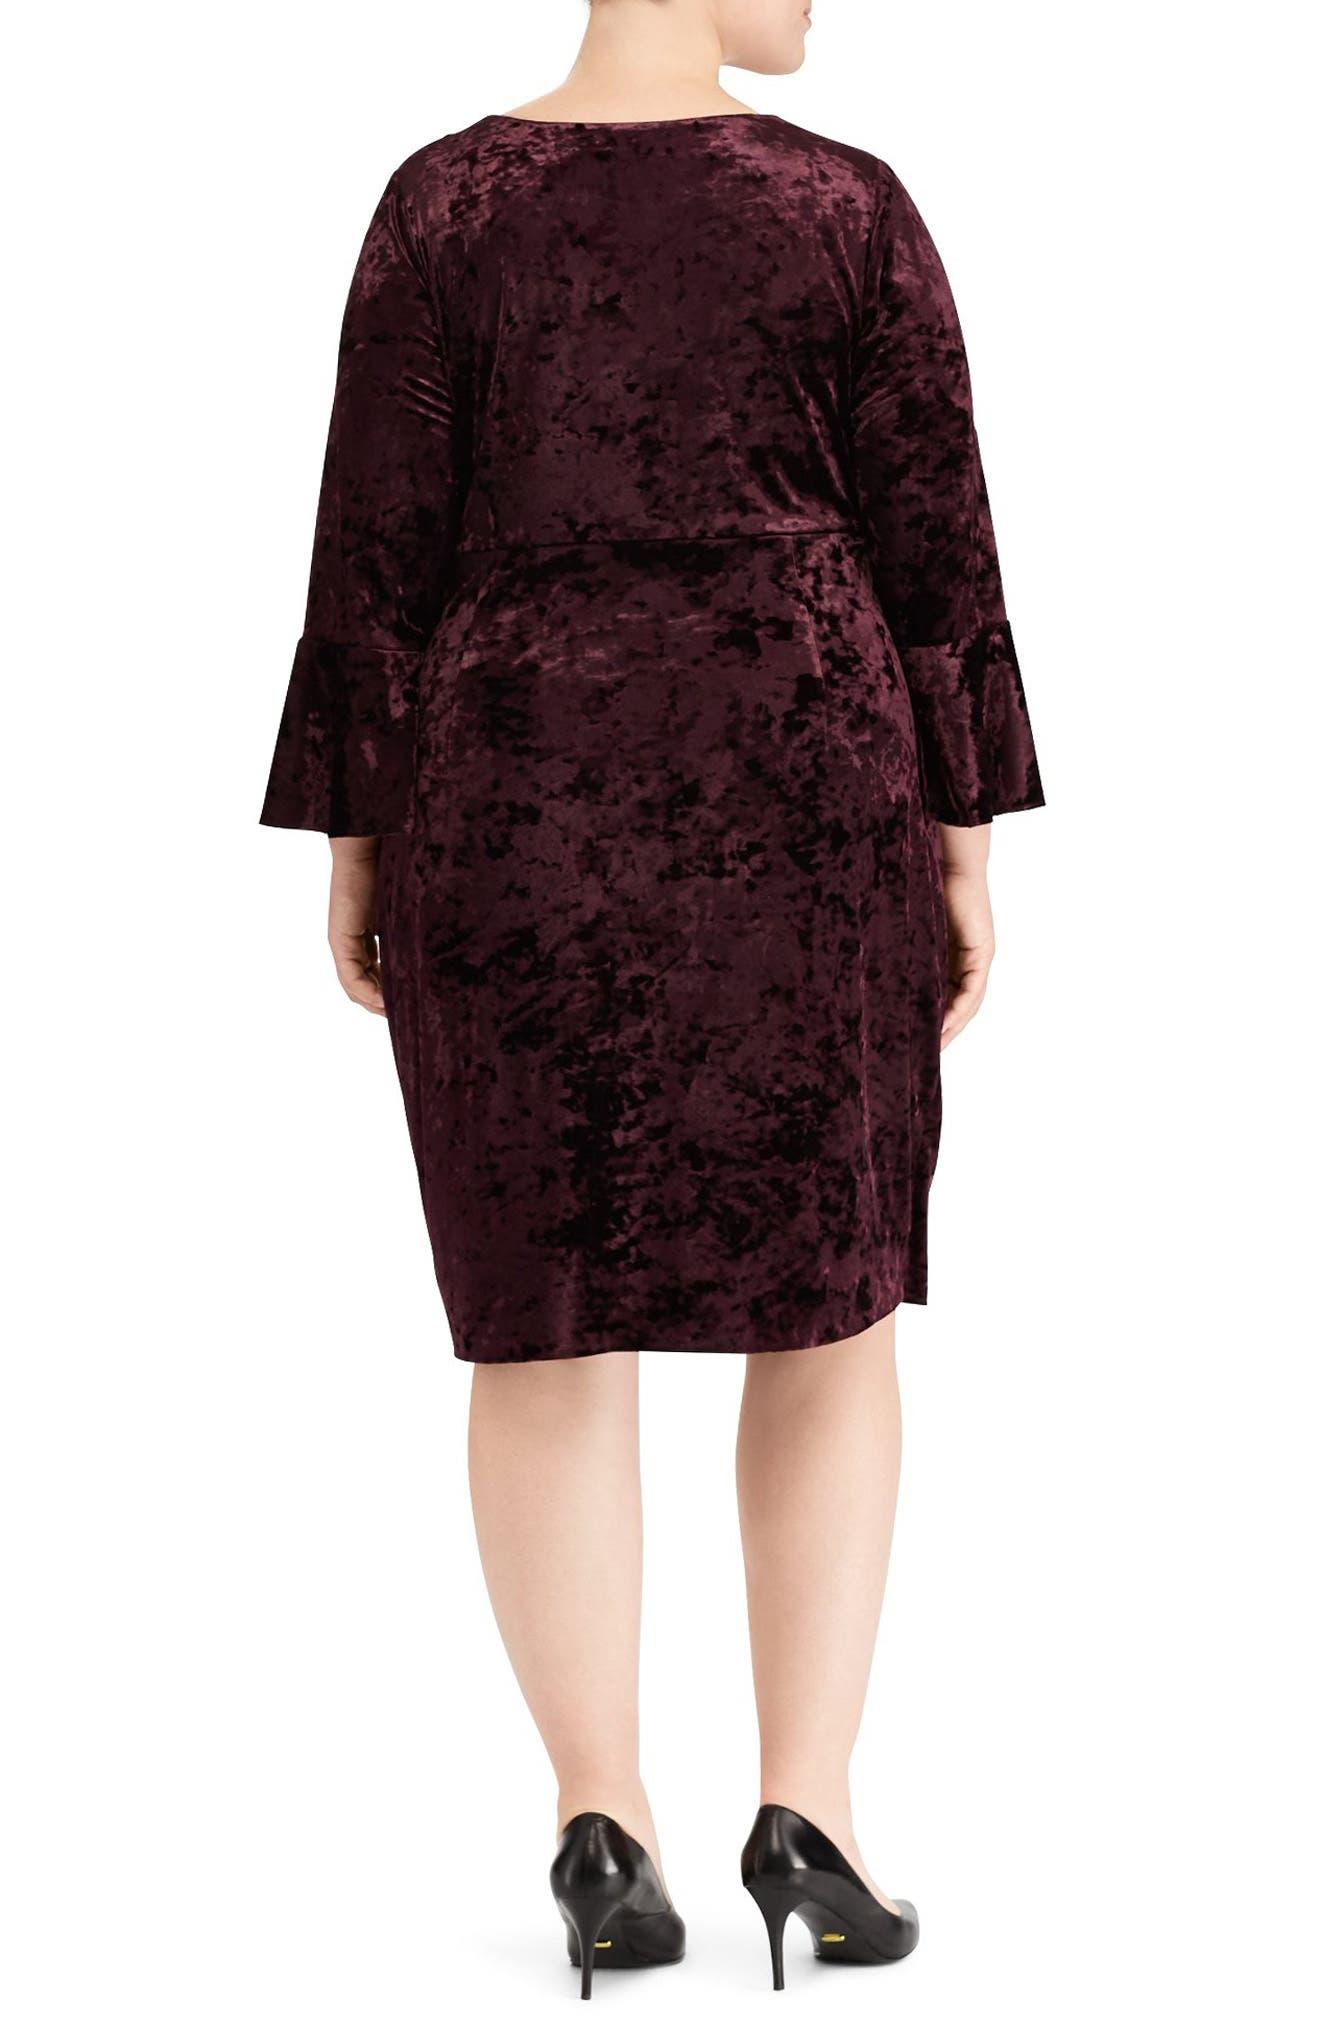 Ruched Crushed Velvet Sheath Dress,                             Alternate thumbnail 2, color,                             Maroon